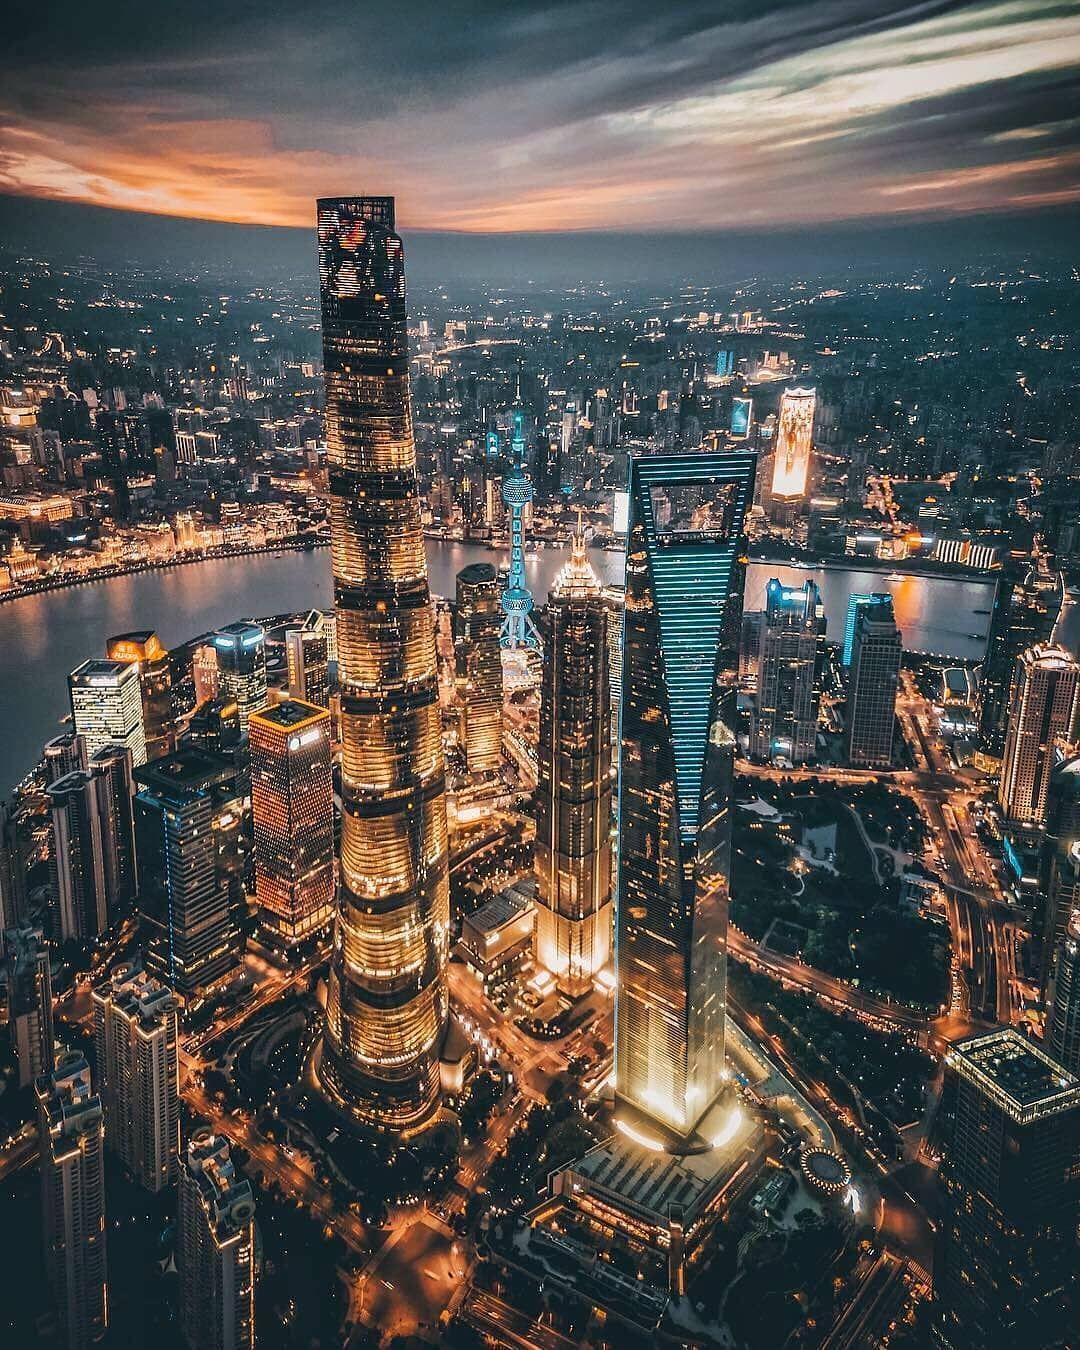 Shanghai China Photo By Youknowcyc Shanghai Night China City Shanghai City